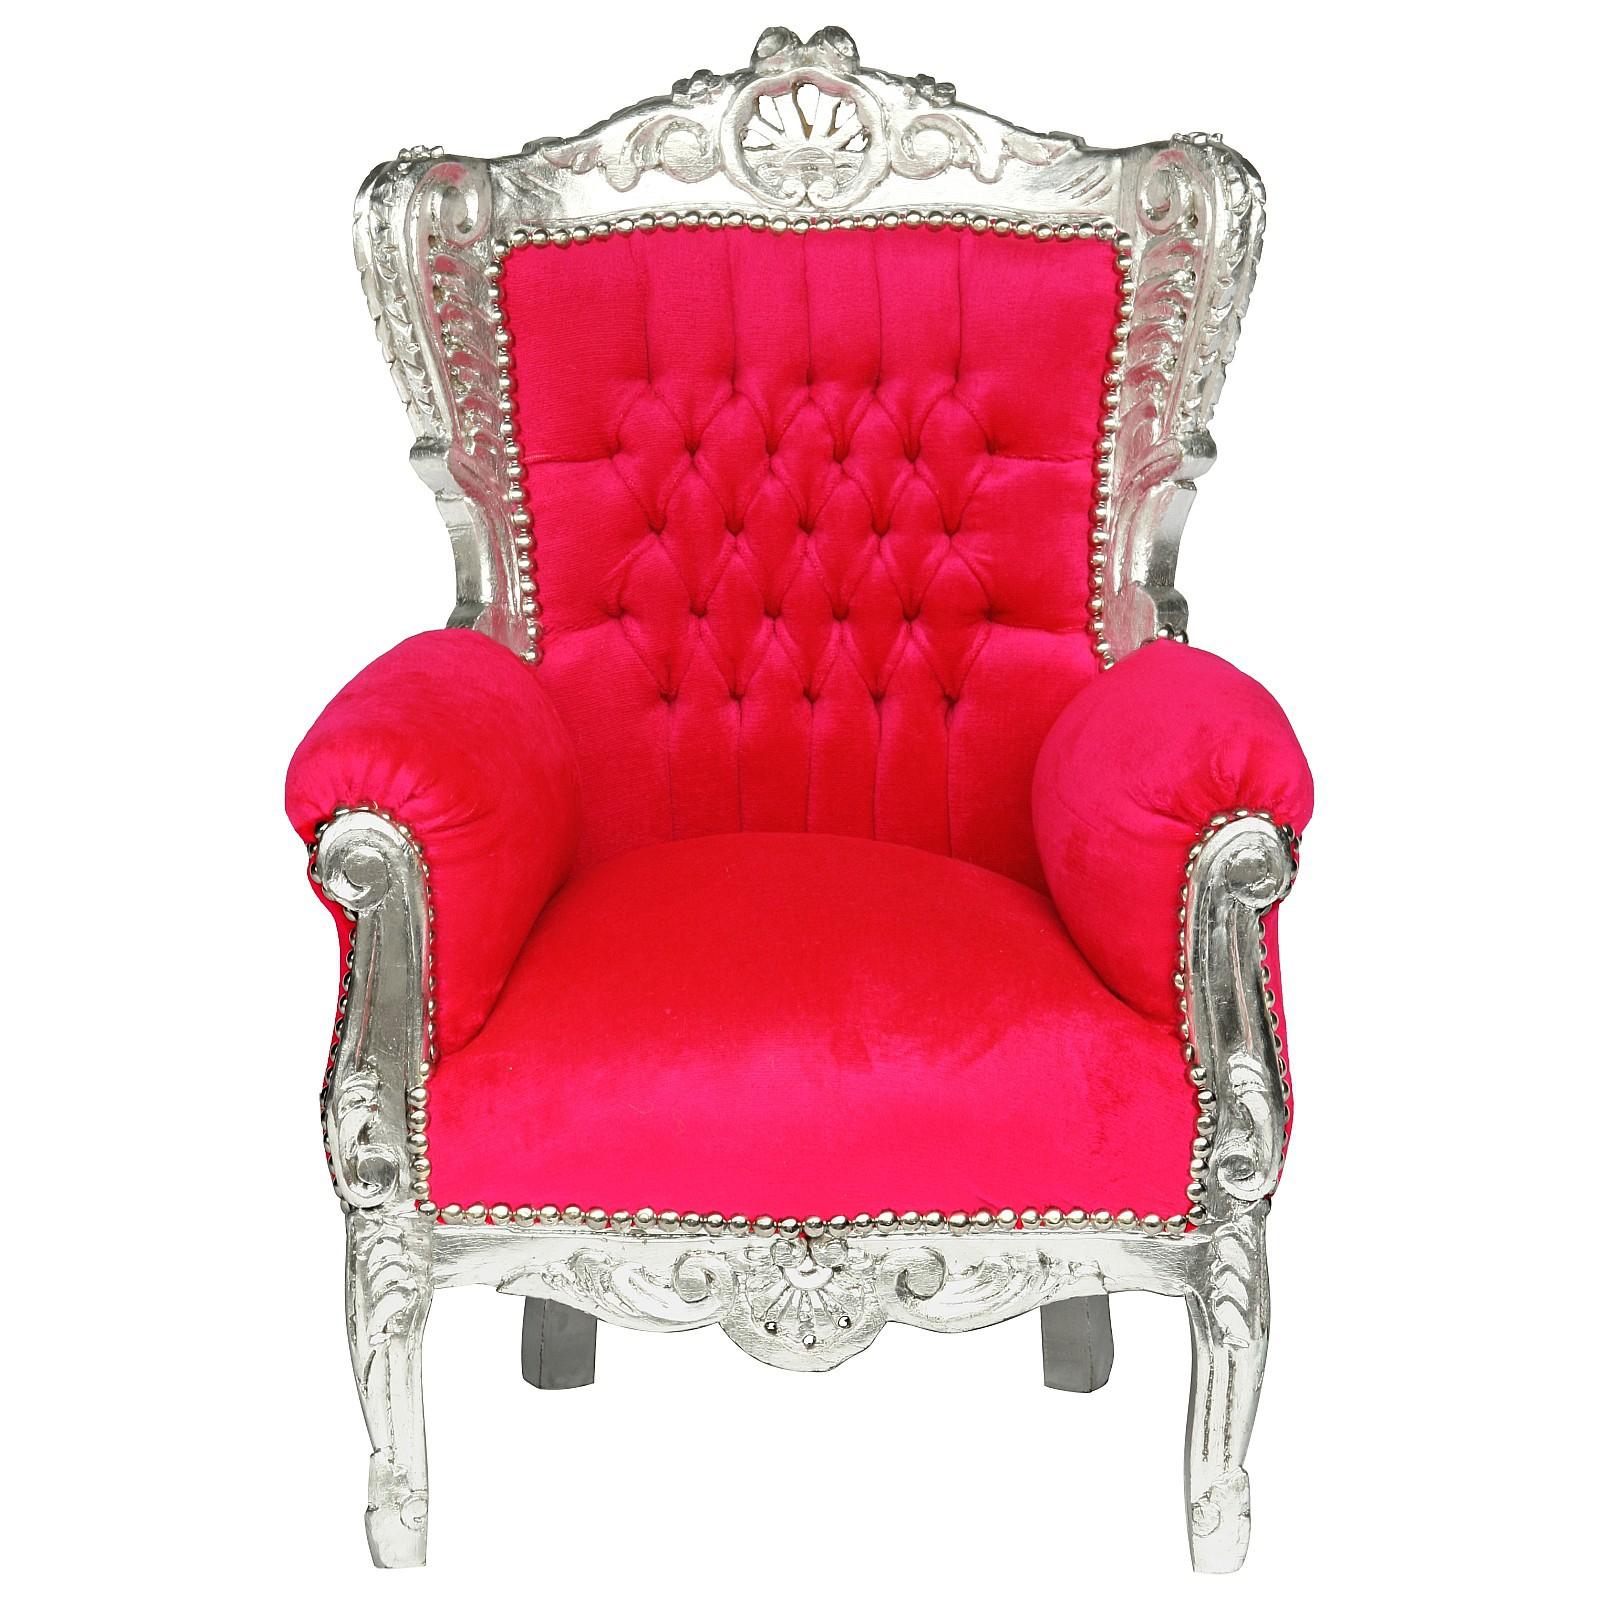 Fun Kid Throne Bright Pink Silver Carved Wood Frame Baroque Furniture U2013  Bild 1